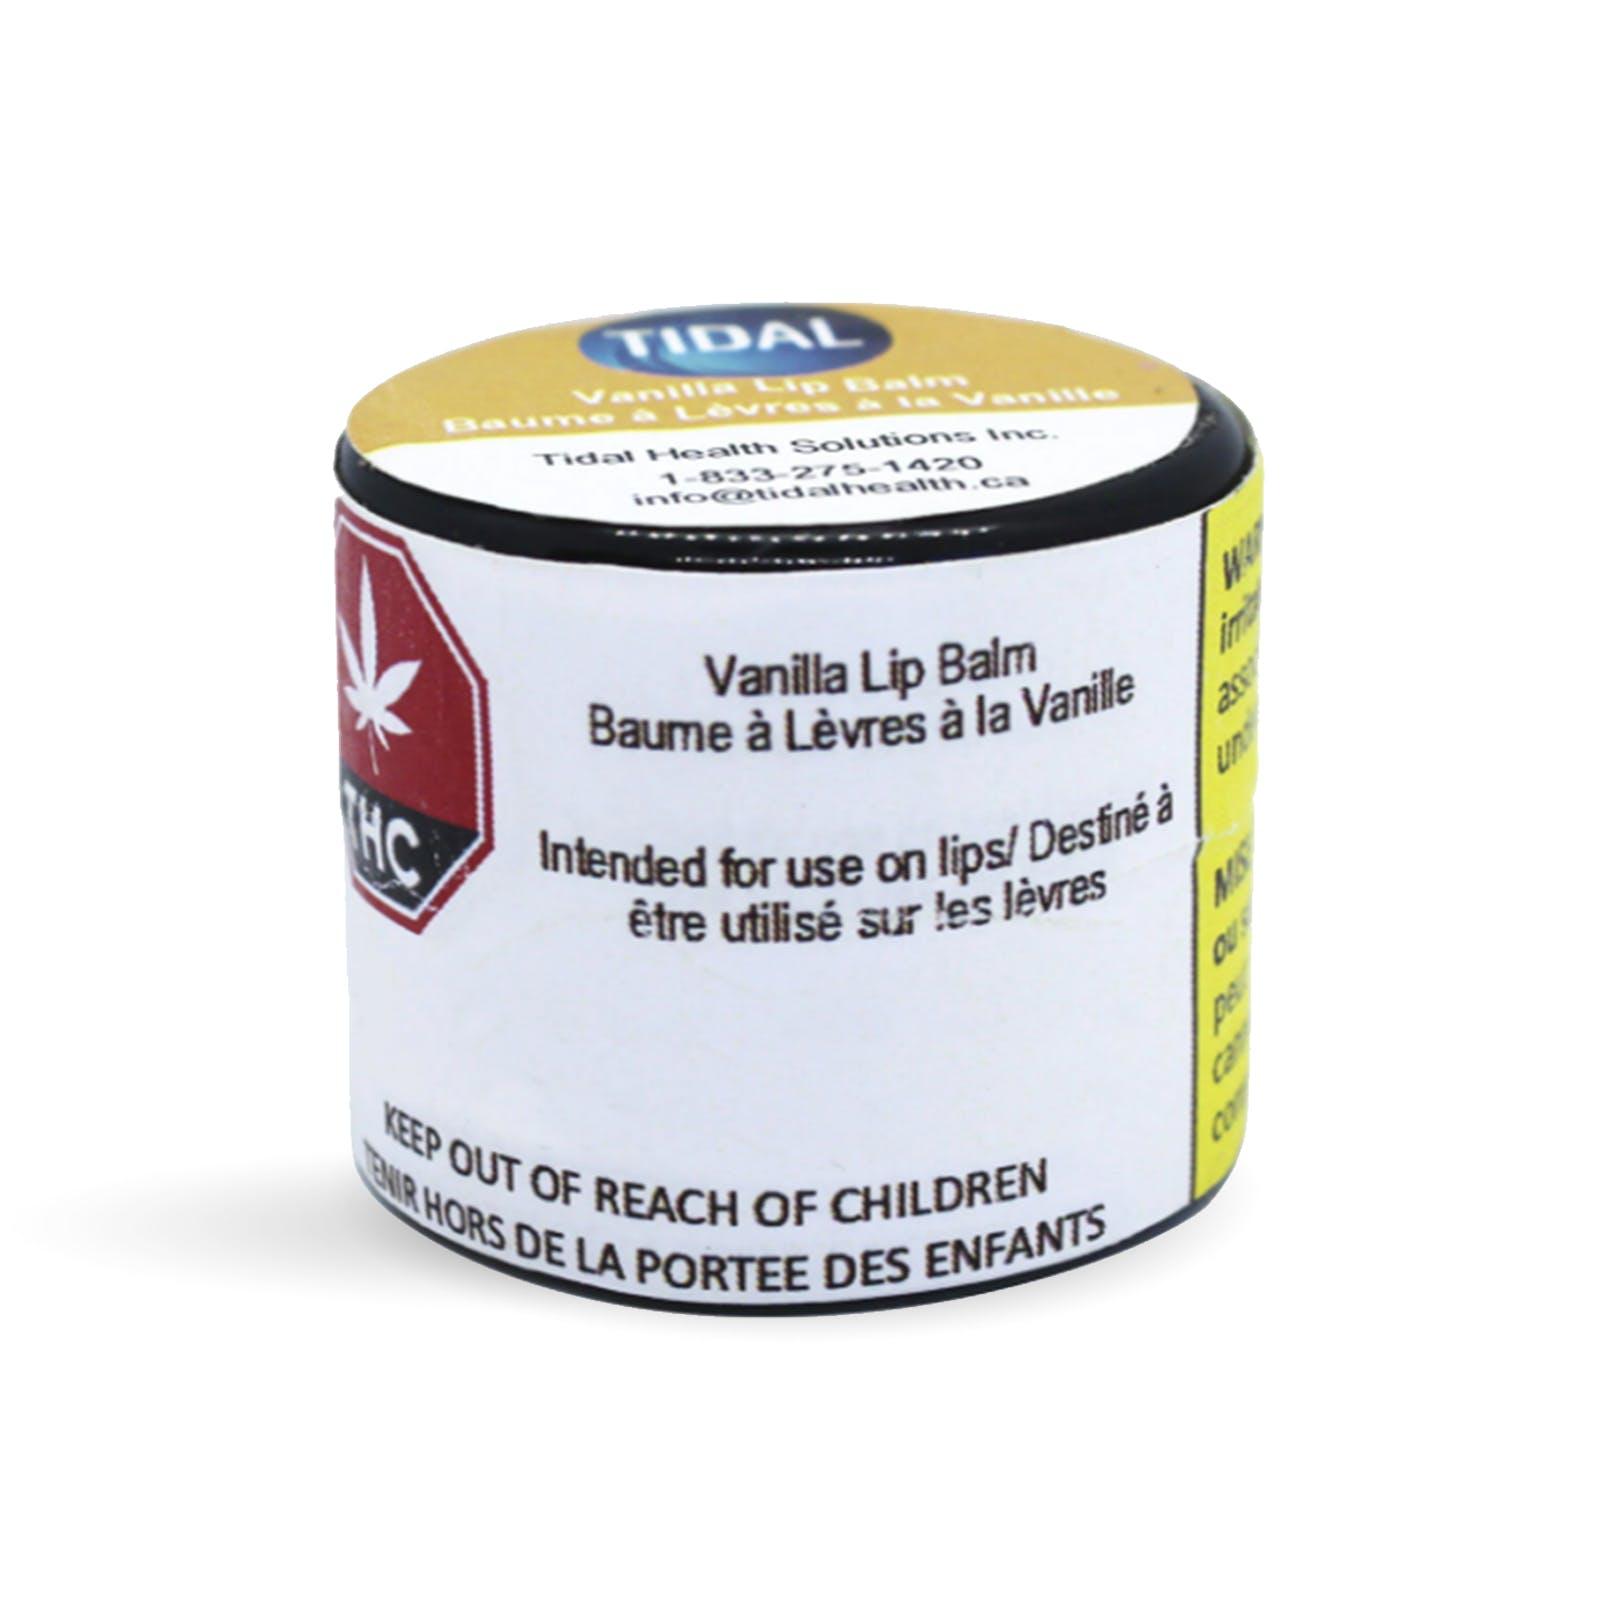 French Vanilla Lip Balm | 5g